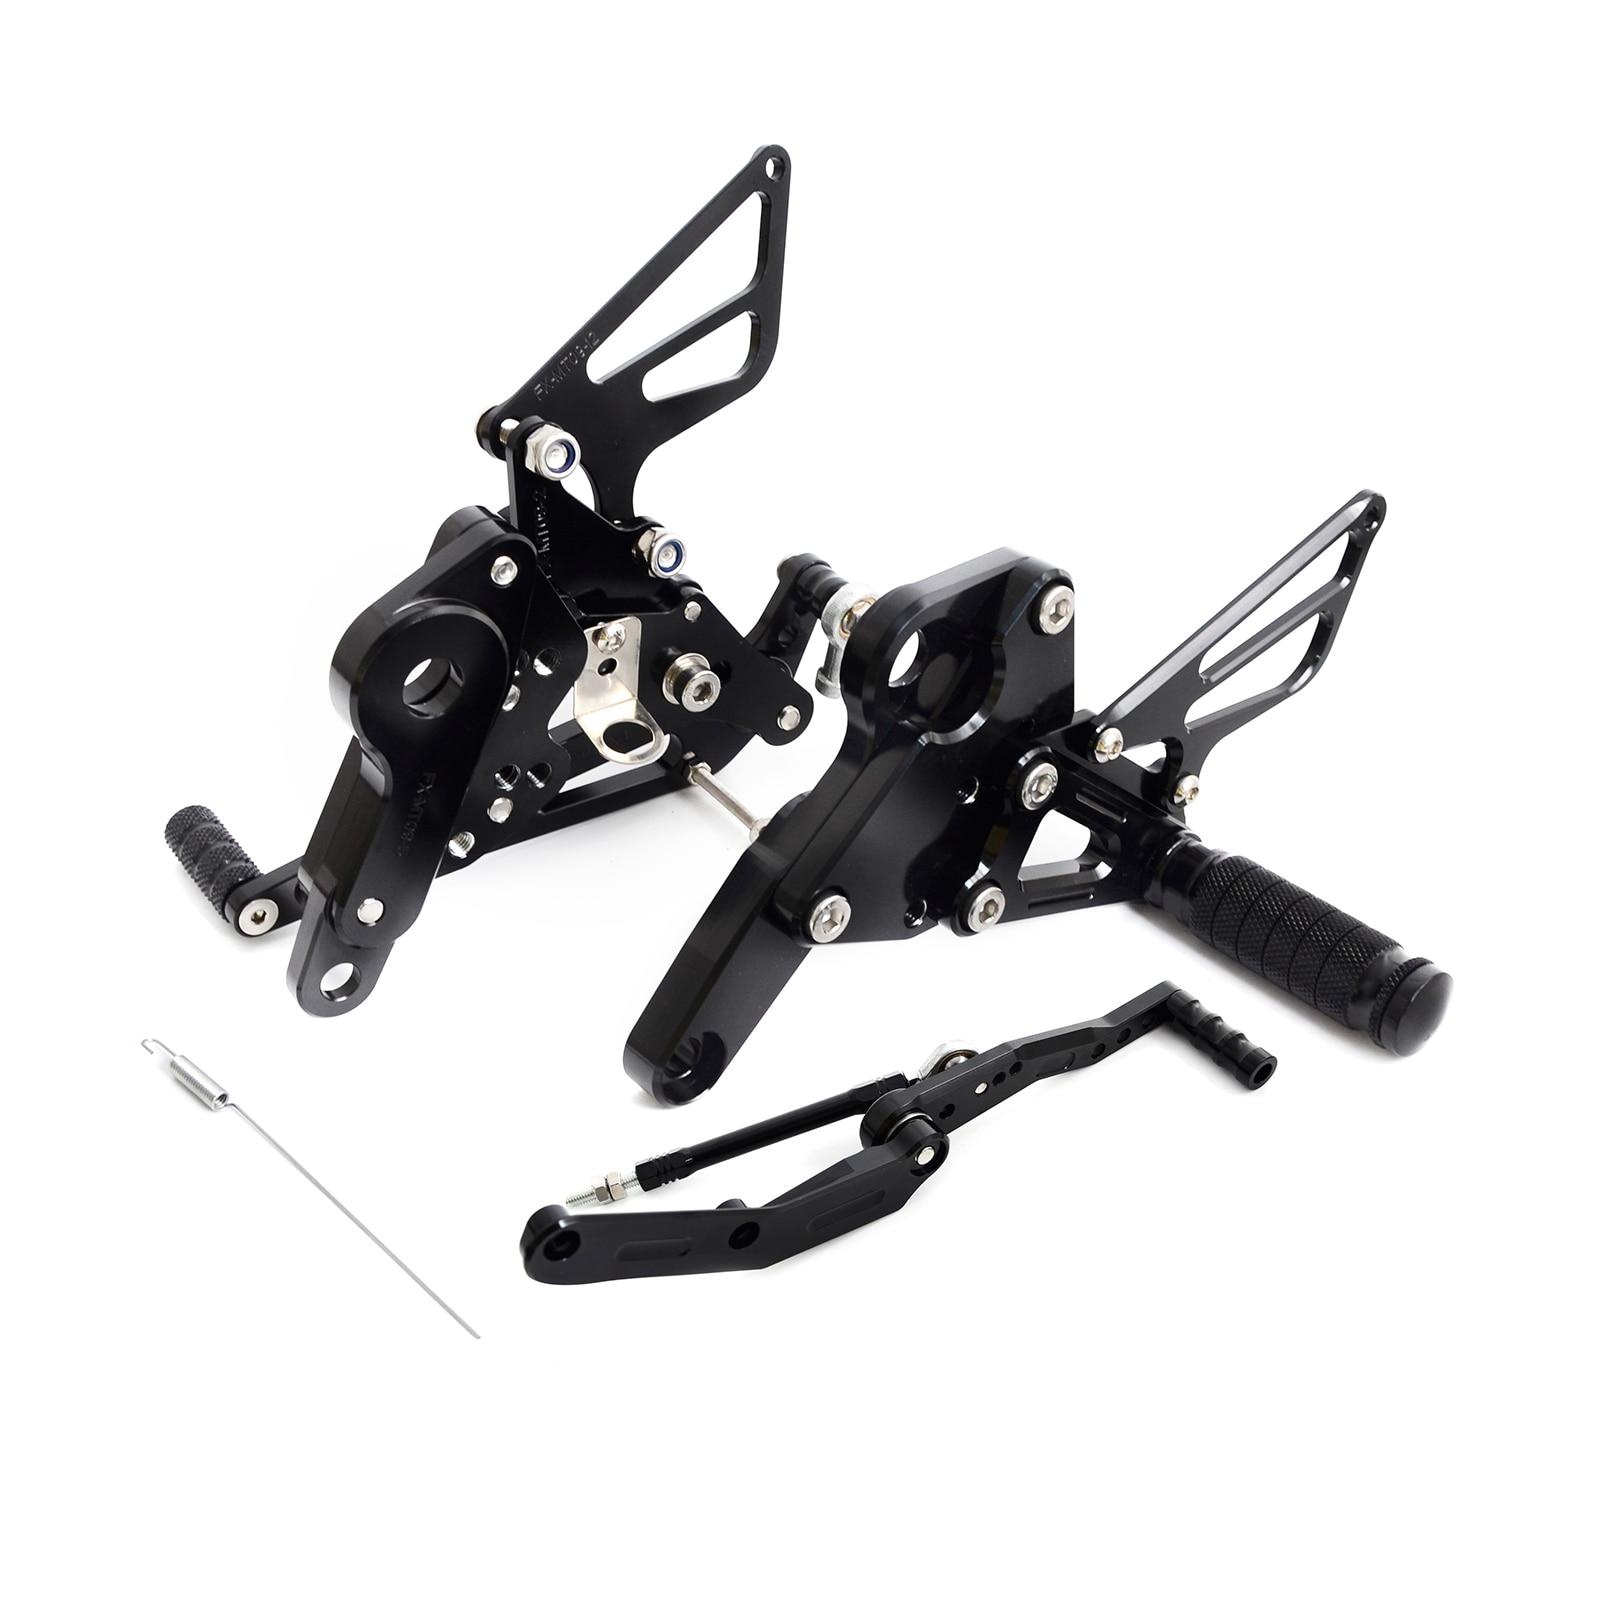 NICECNC CNC Adjustable Rearsets Foot Peg Footrest Footpeg For For Yamaha MT-09 MT09 FZ09 FZ-09 2013 2014 2015 2016 bjmoto motorcycle mt09 fz09 adjustable cnc foot rest peg rear set for yamaha mt 09 fz 09 2013 2014 2015 2016